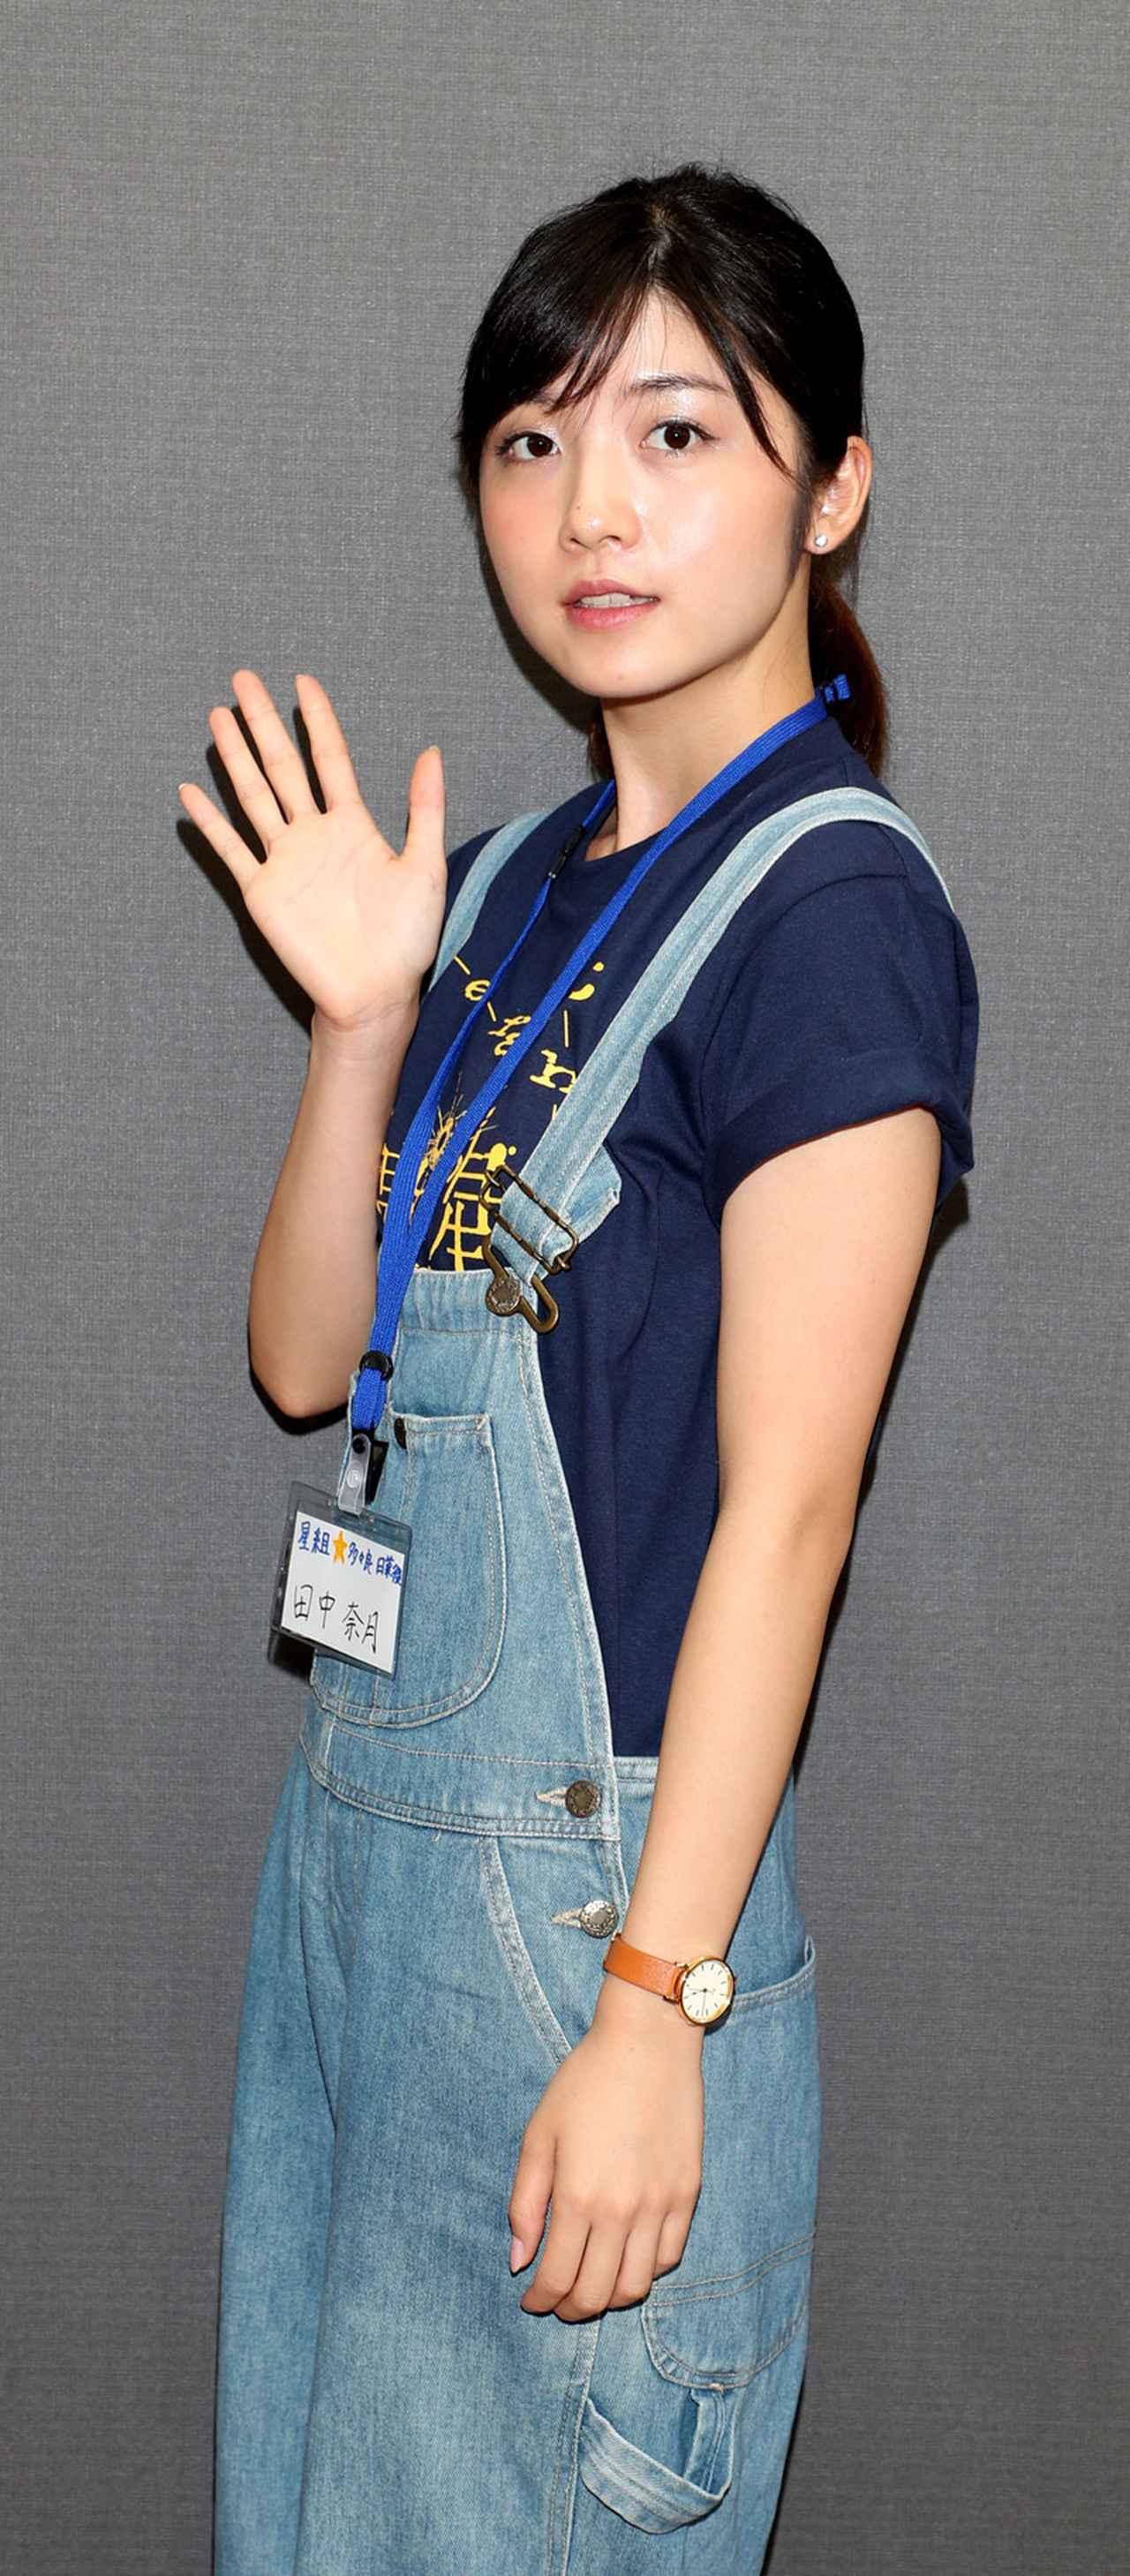 Images : 4番目の画像 - 「田中奈月/将来有望な若手女優の中でも大注目の一人が、アリスインプロジェクト最新作で印象に残る役を熱演!」のアルバム - Stereo Sound ONLINE